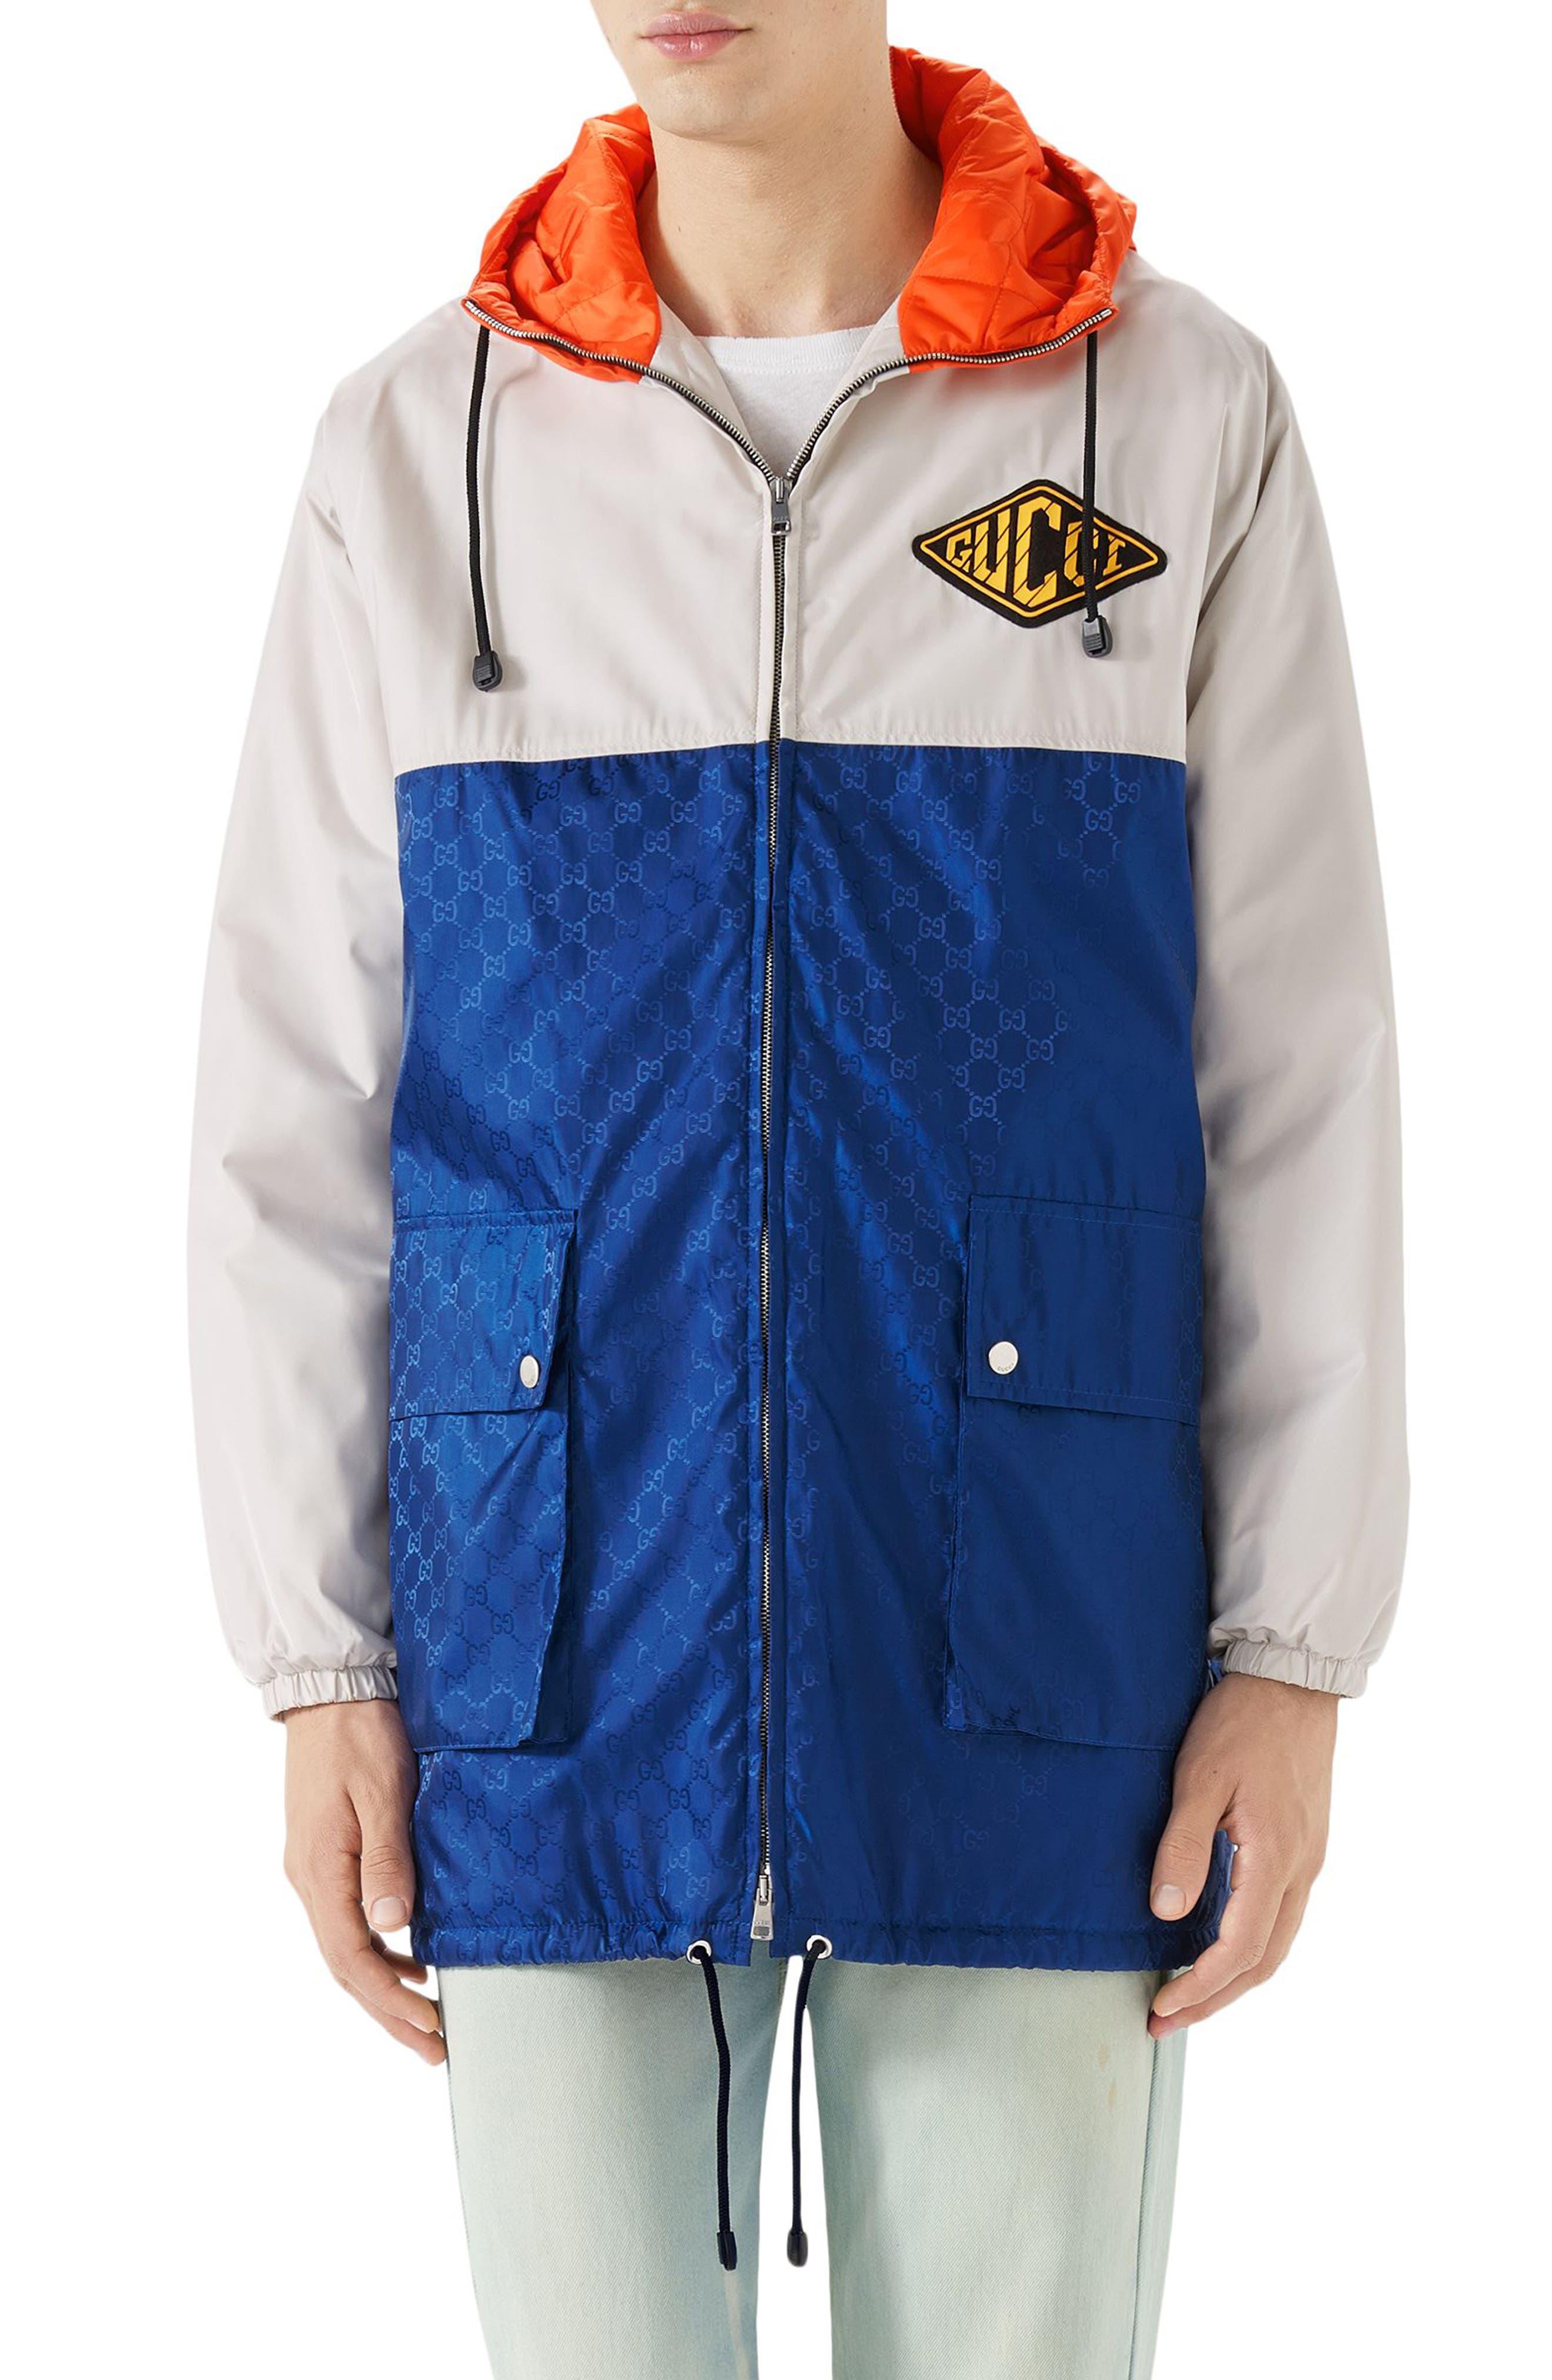 Multicolor Hooded Jacket,                             Main thumbnail 1, color,                             BLUE